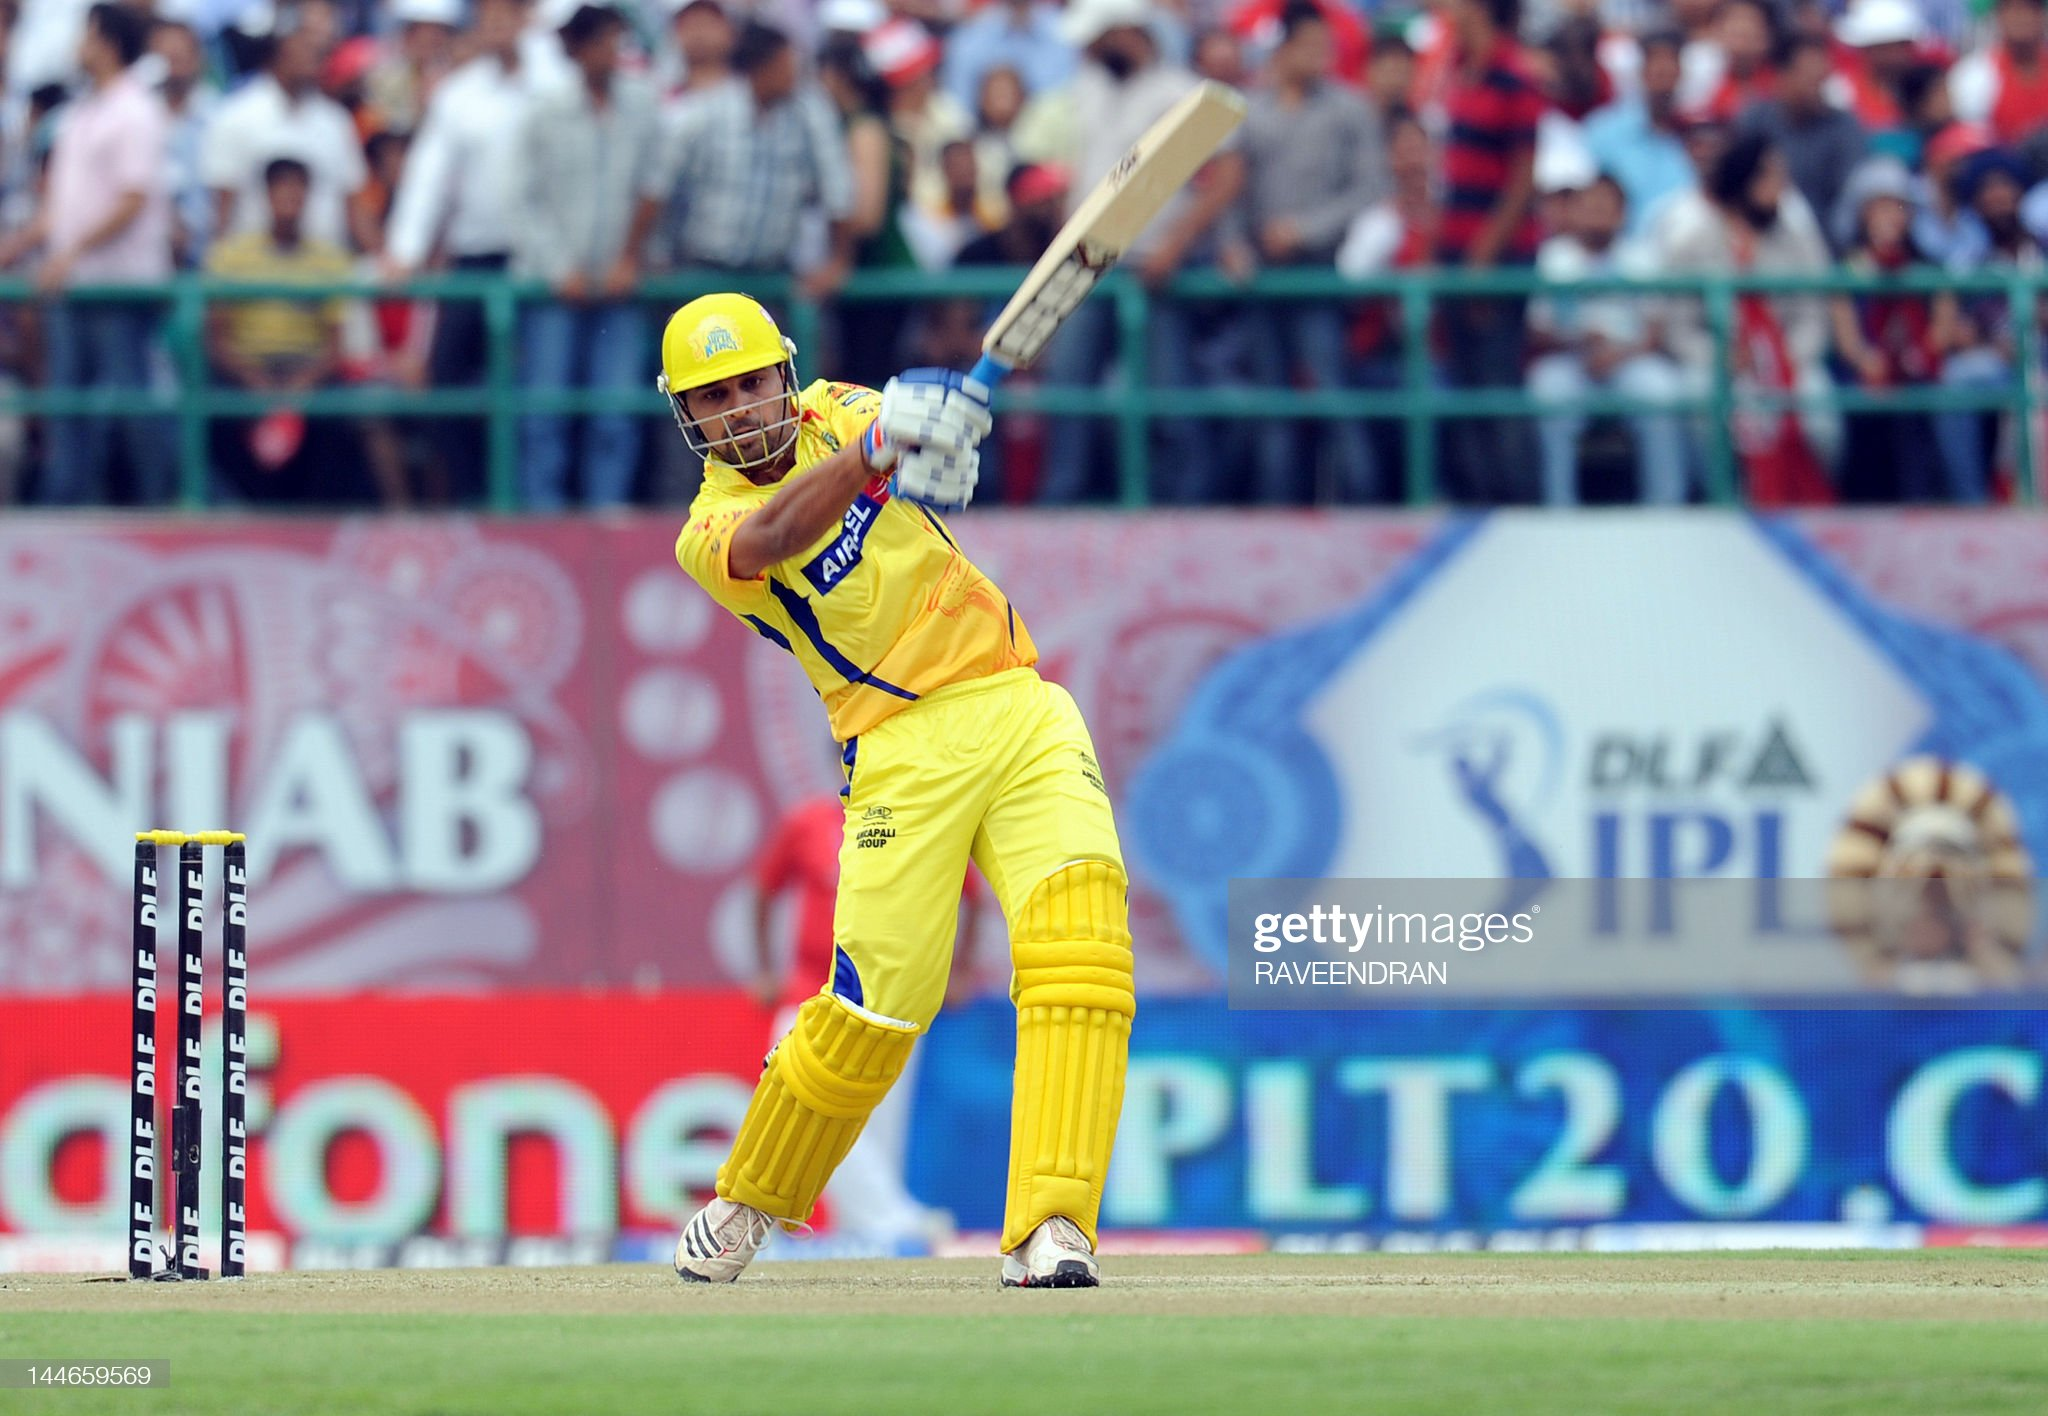 Chennai Super King batsman Murali Vijay : News Photo